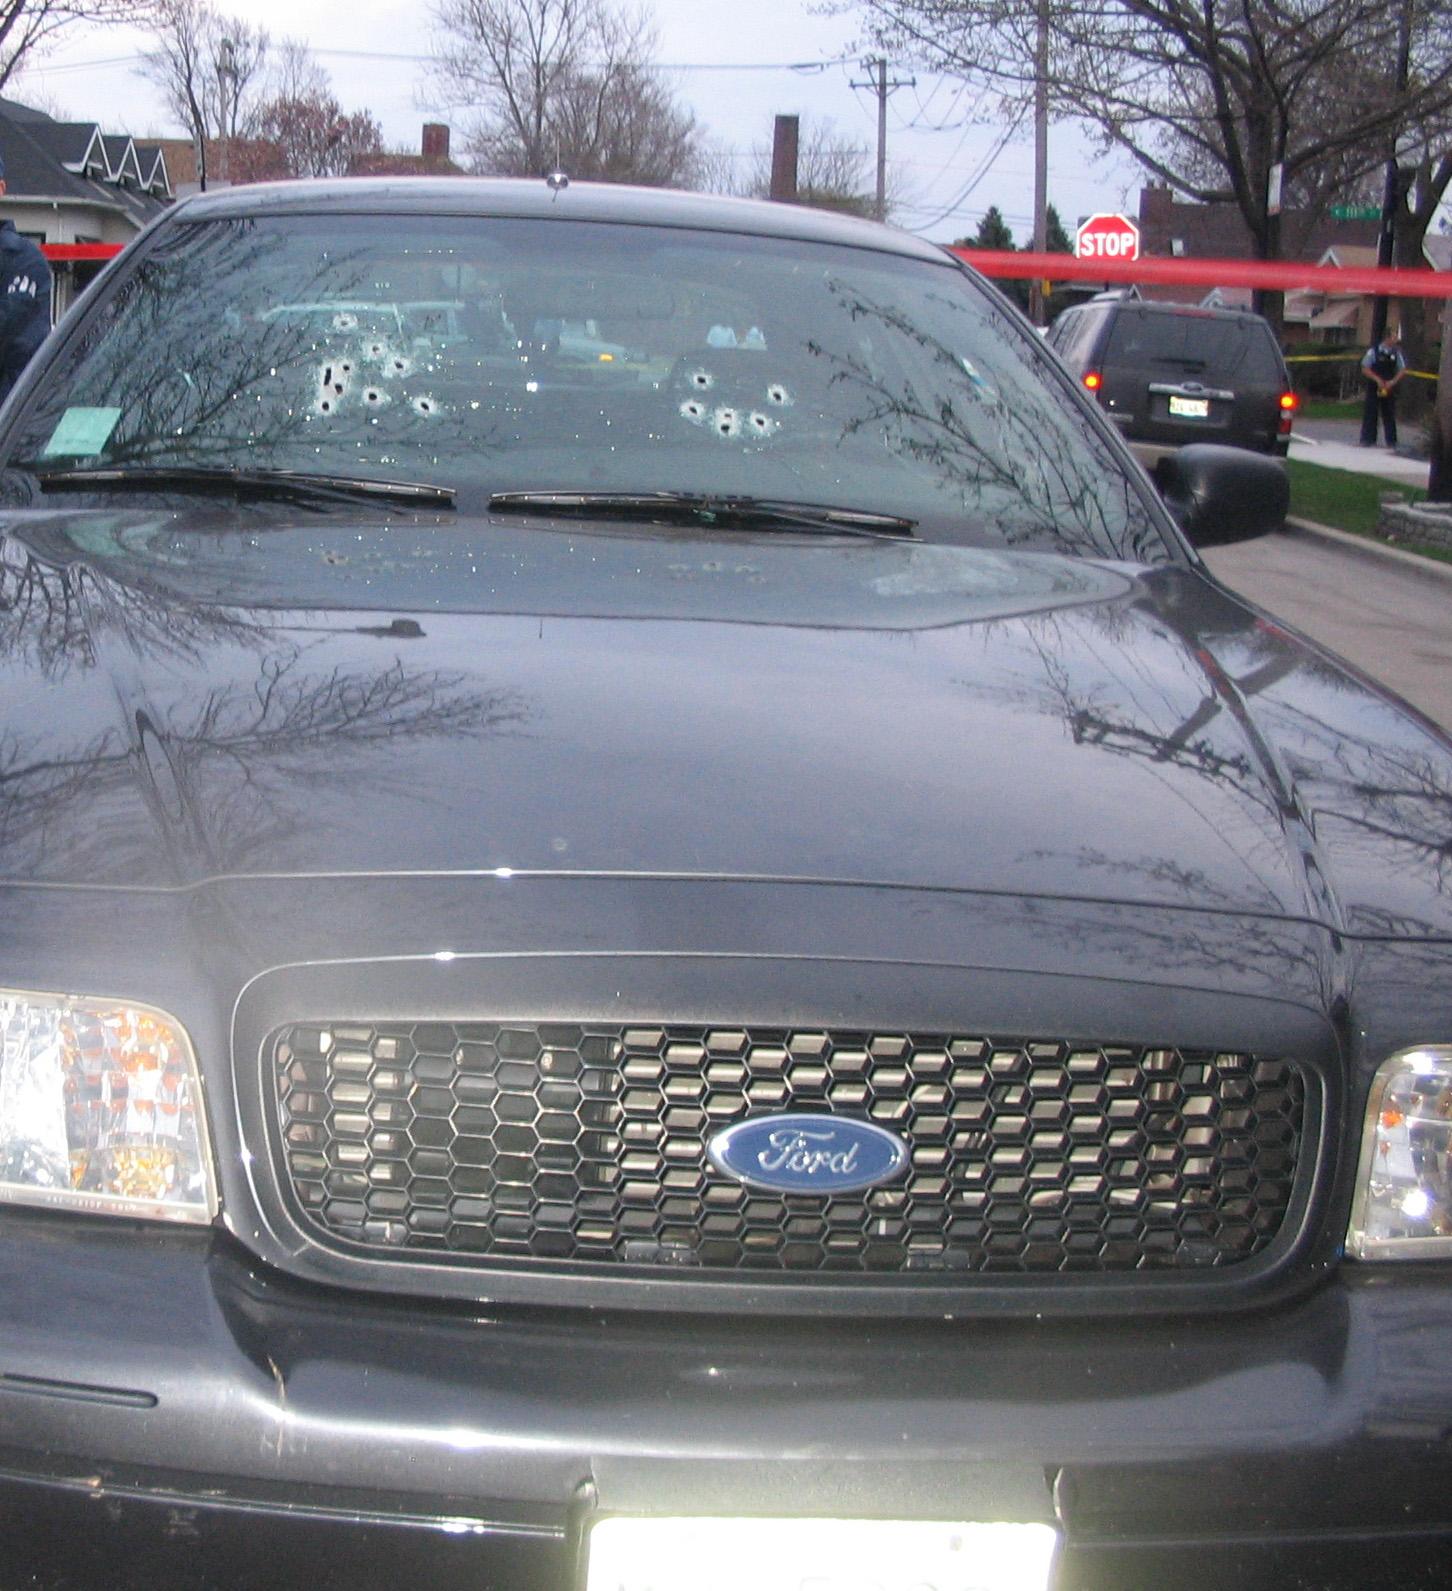 Cop Car Shot up w/AK-47